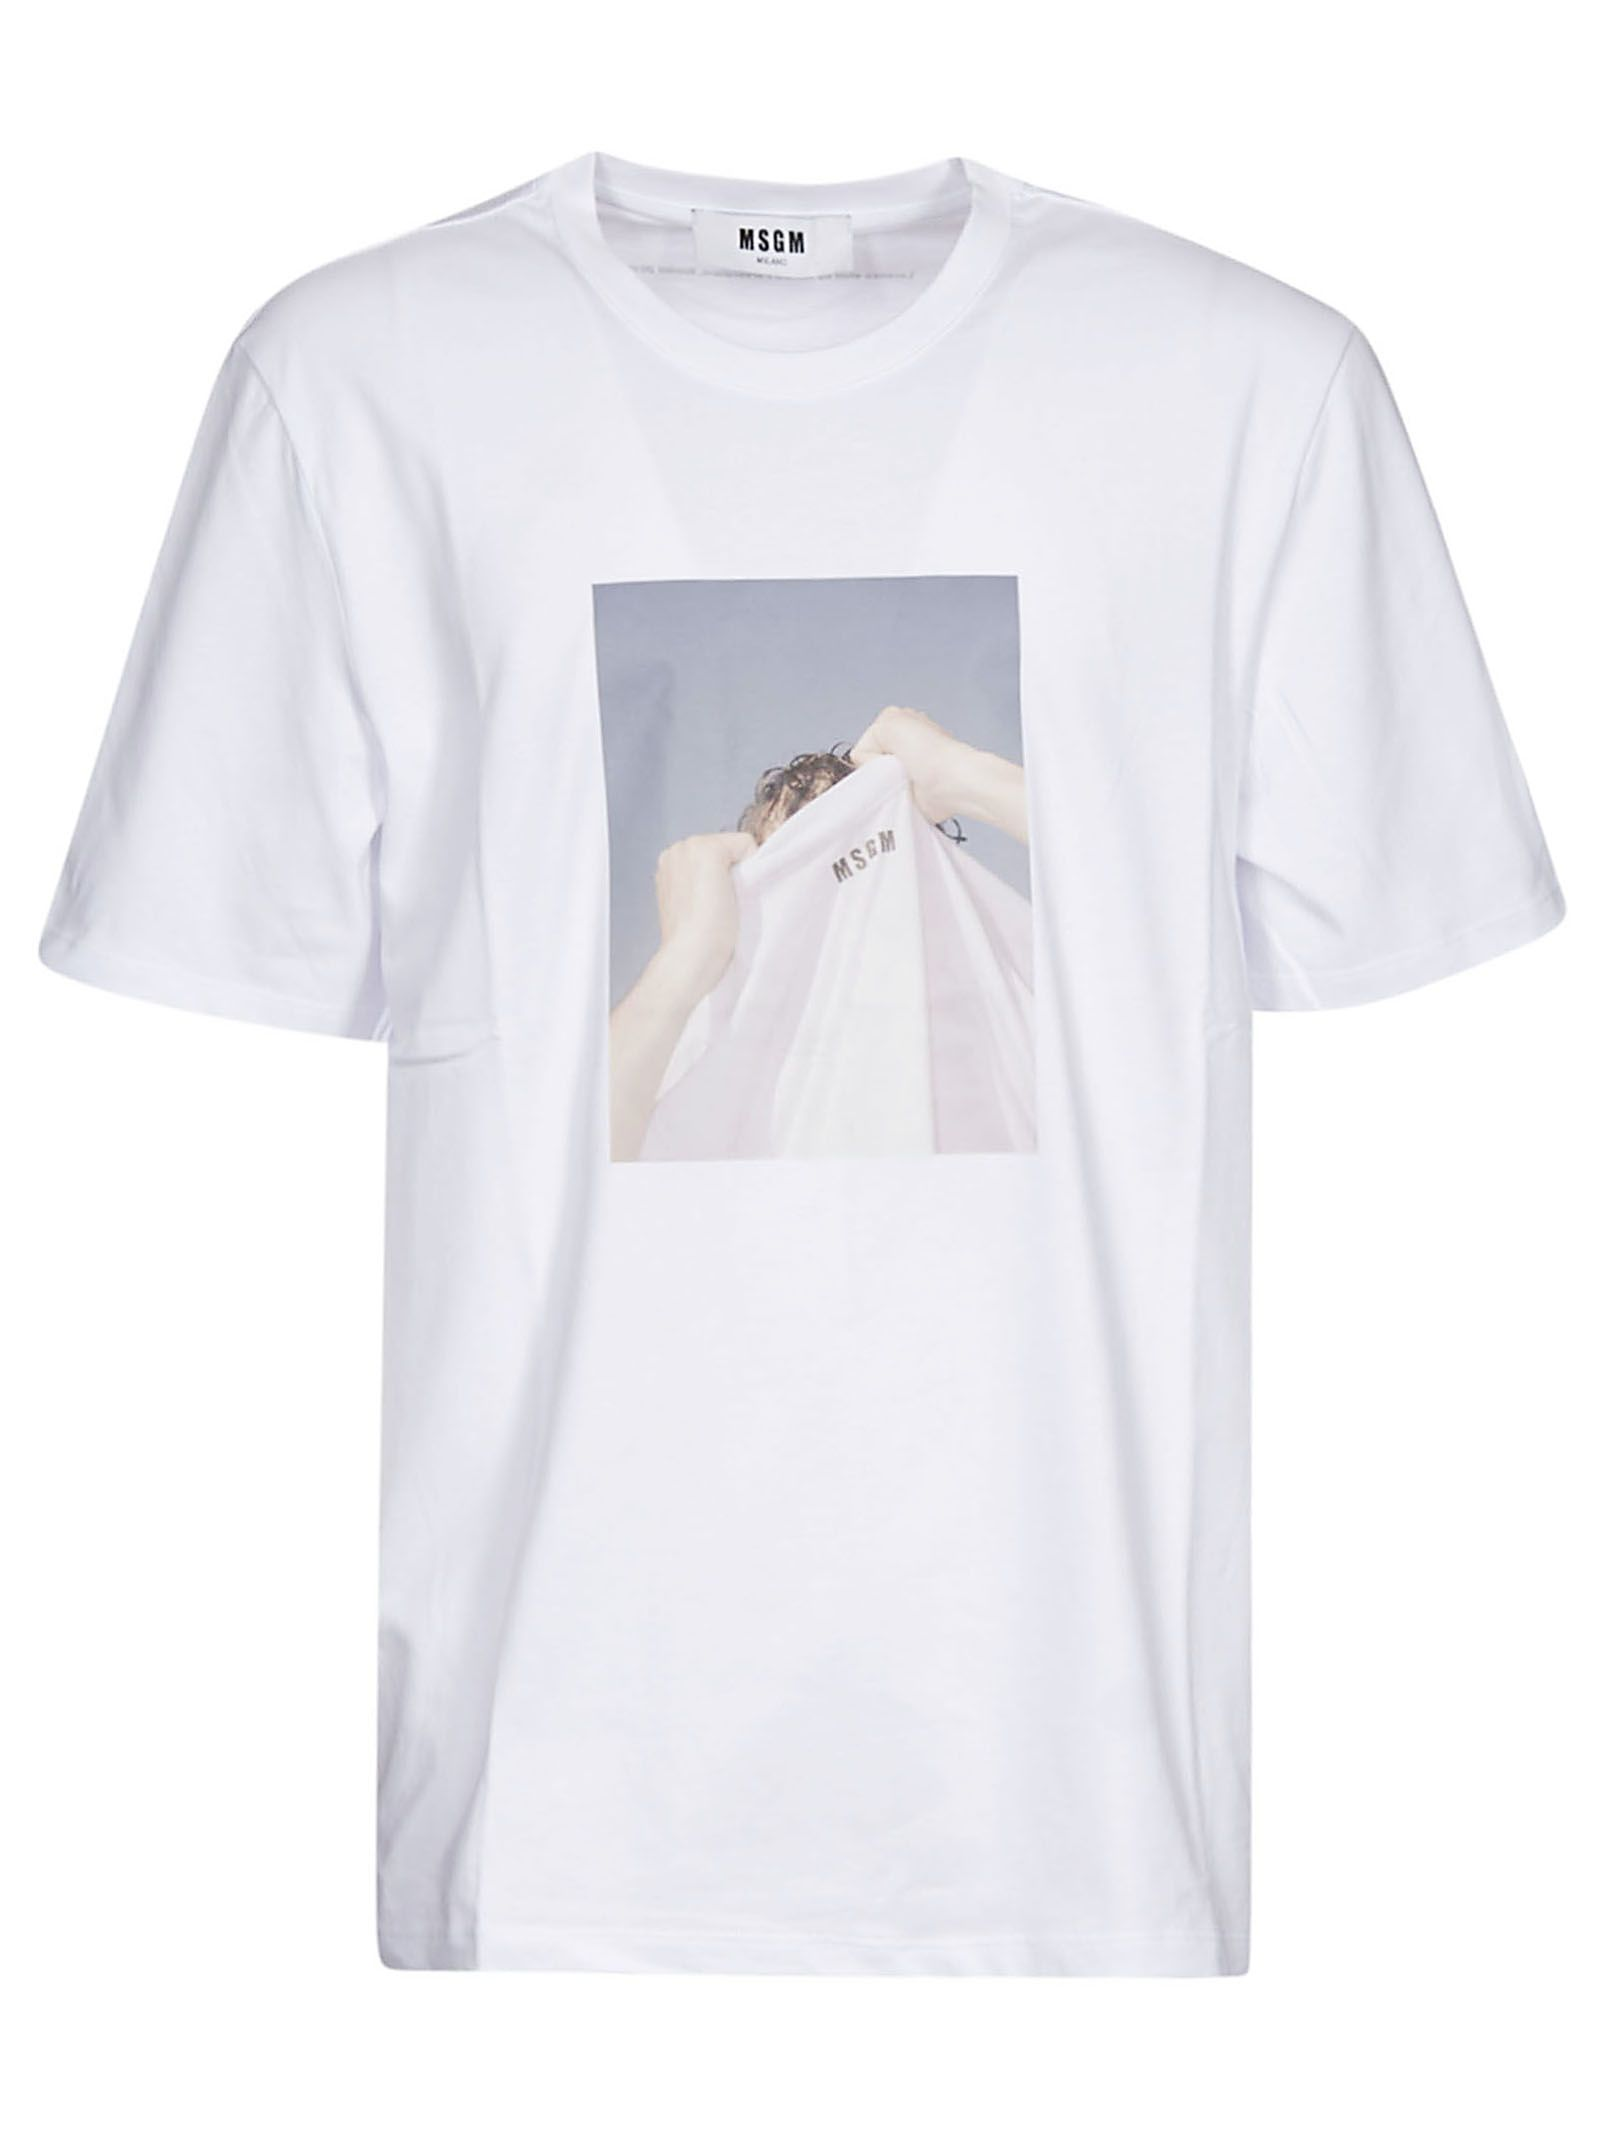 MSGM Graphic Photo Print T-Shirt